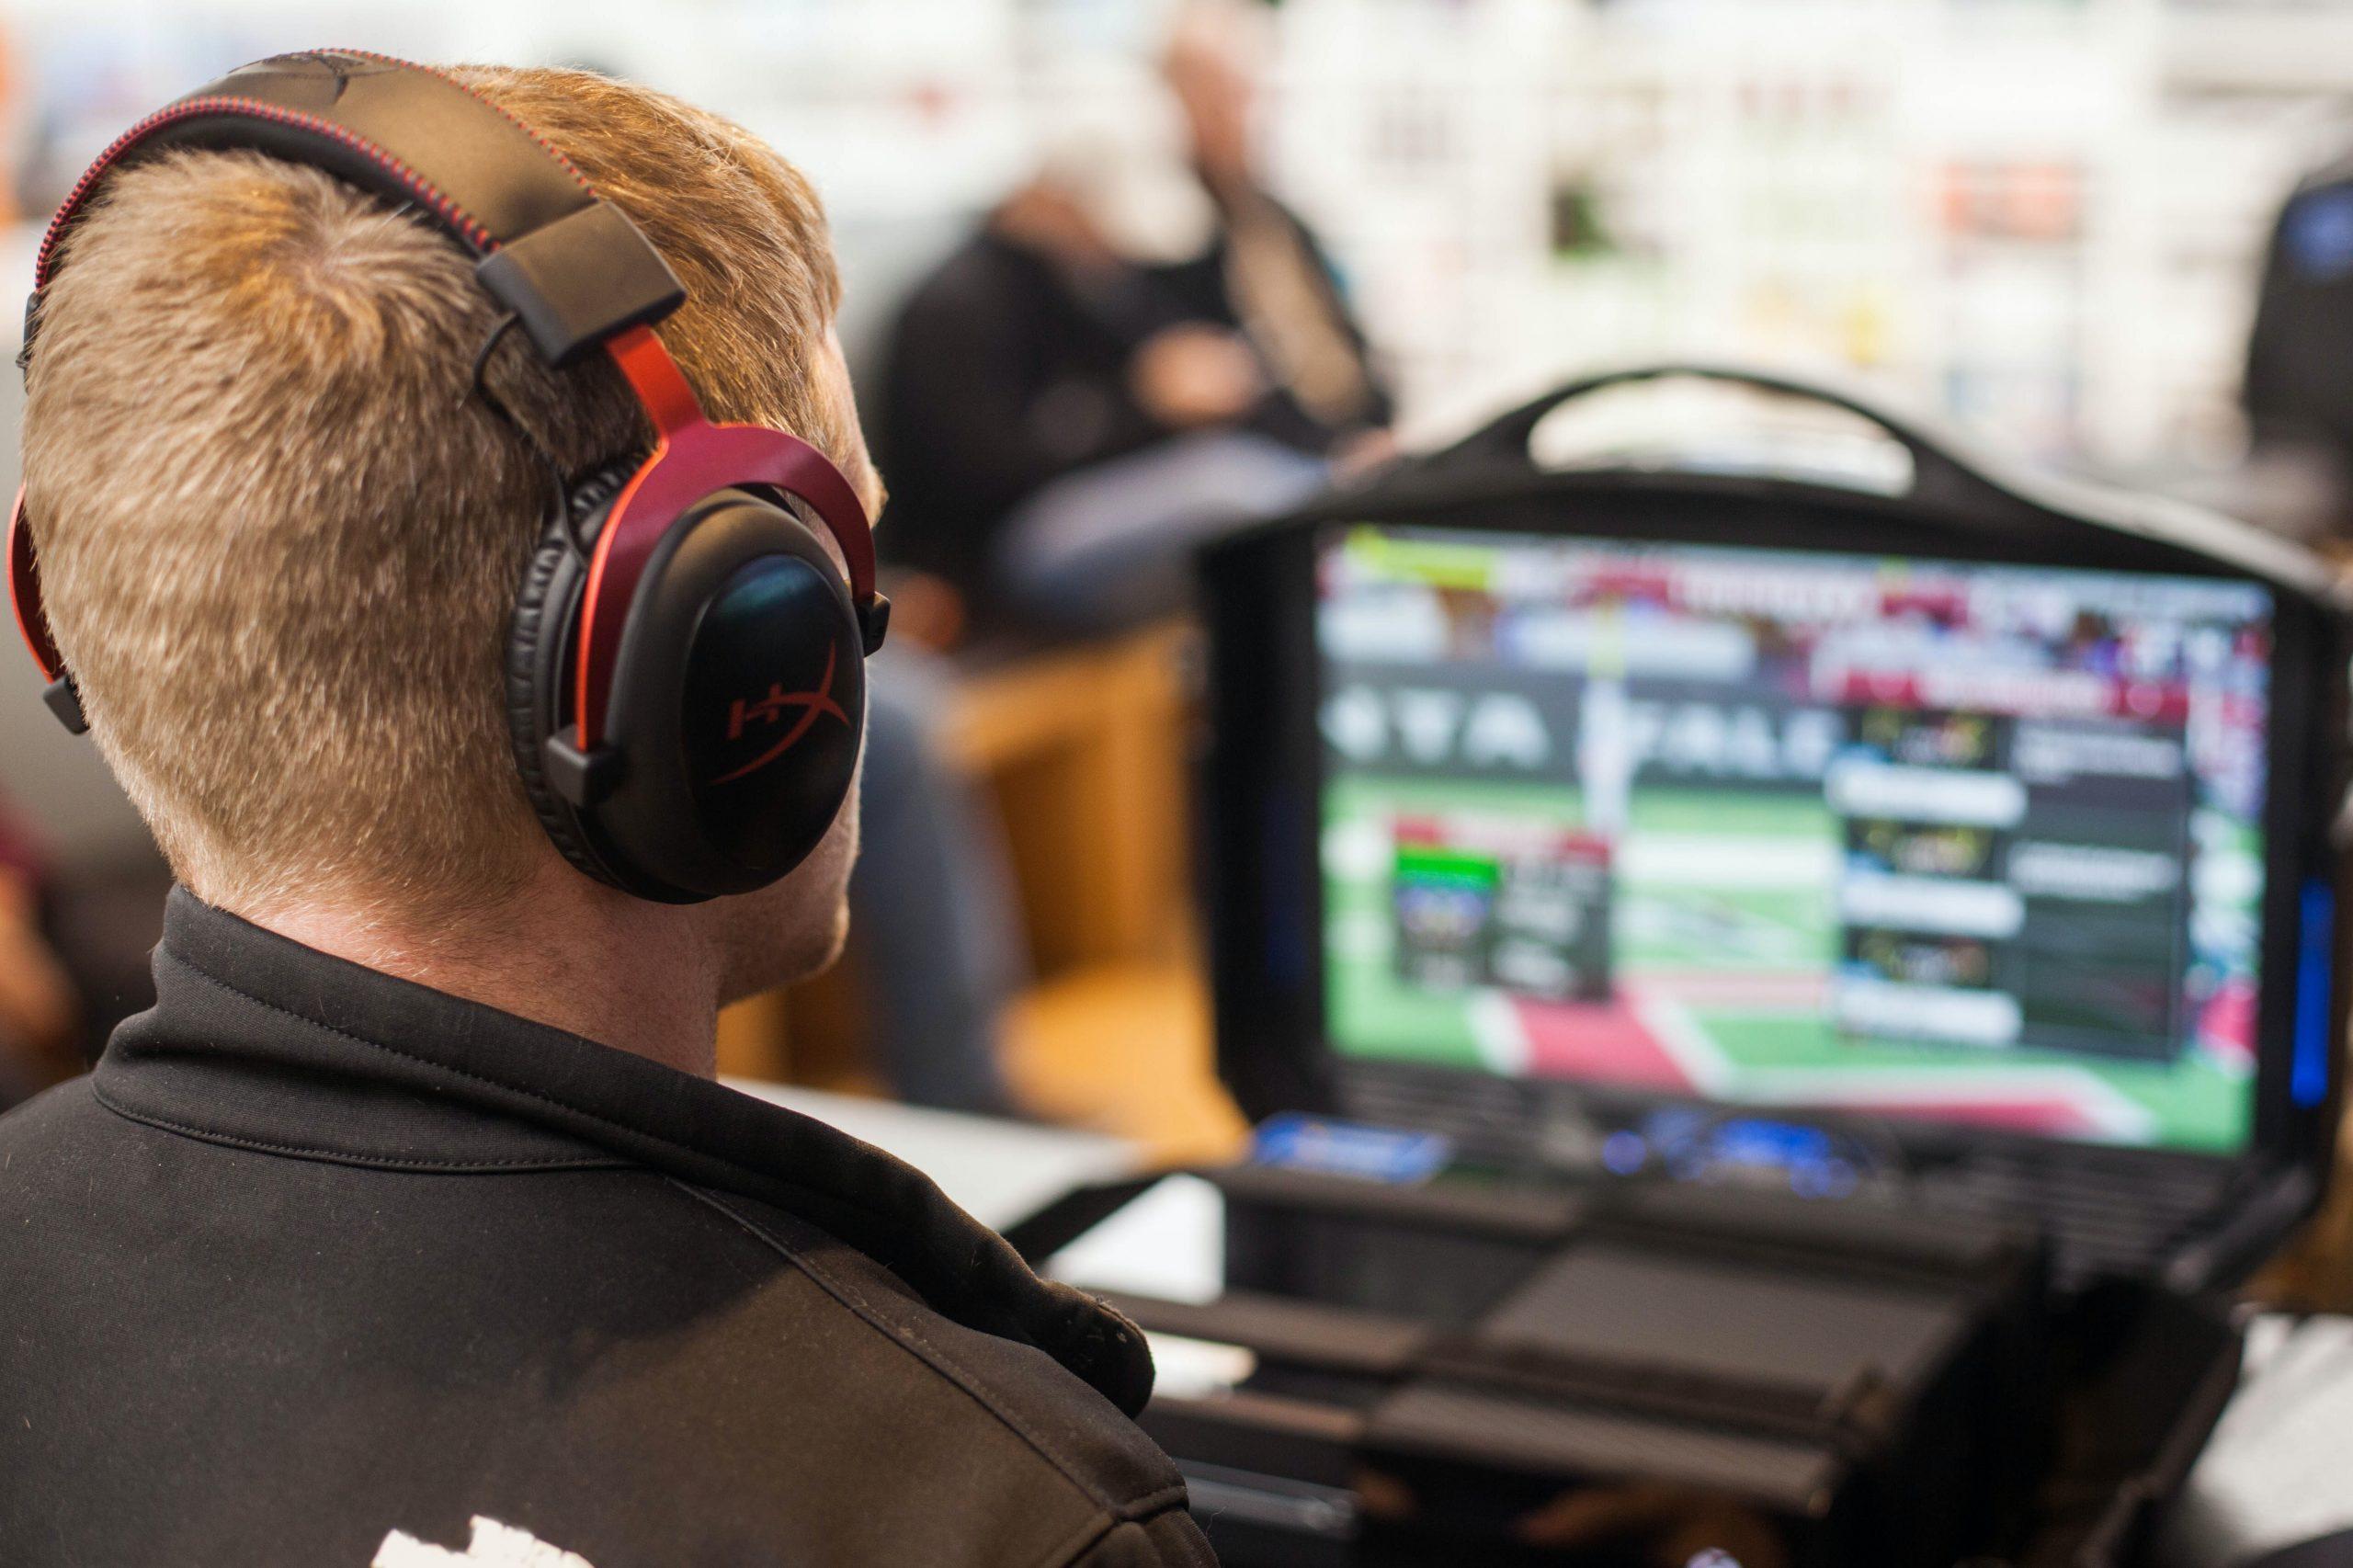 Chico gamer usando Auriculares gaming